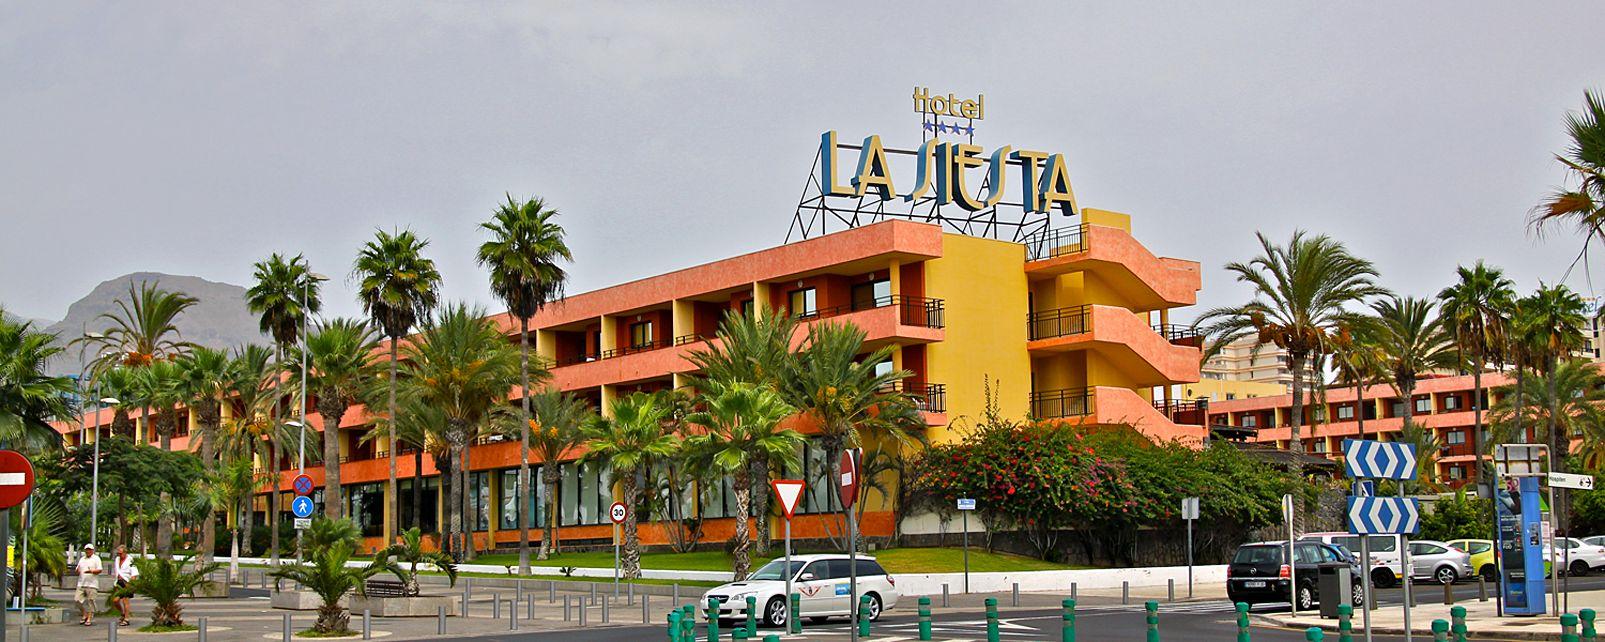 La Siesta Hotel Teneriffa